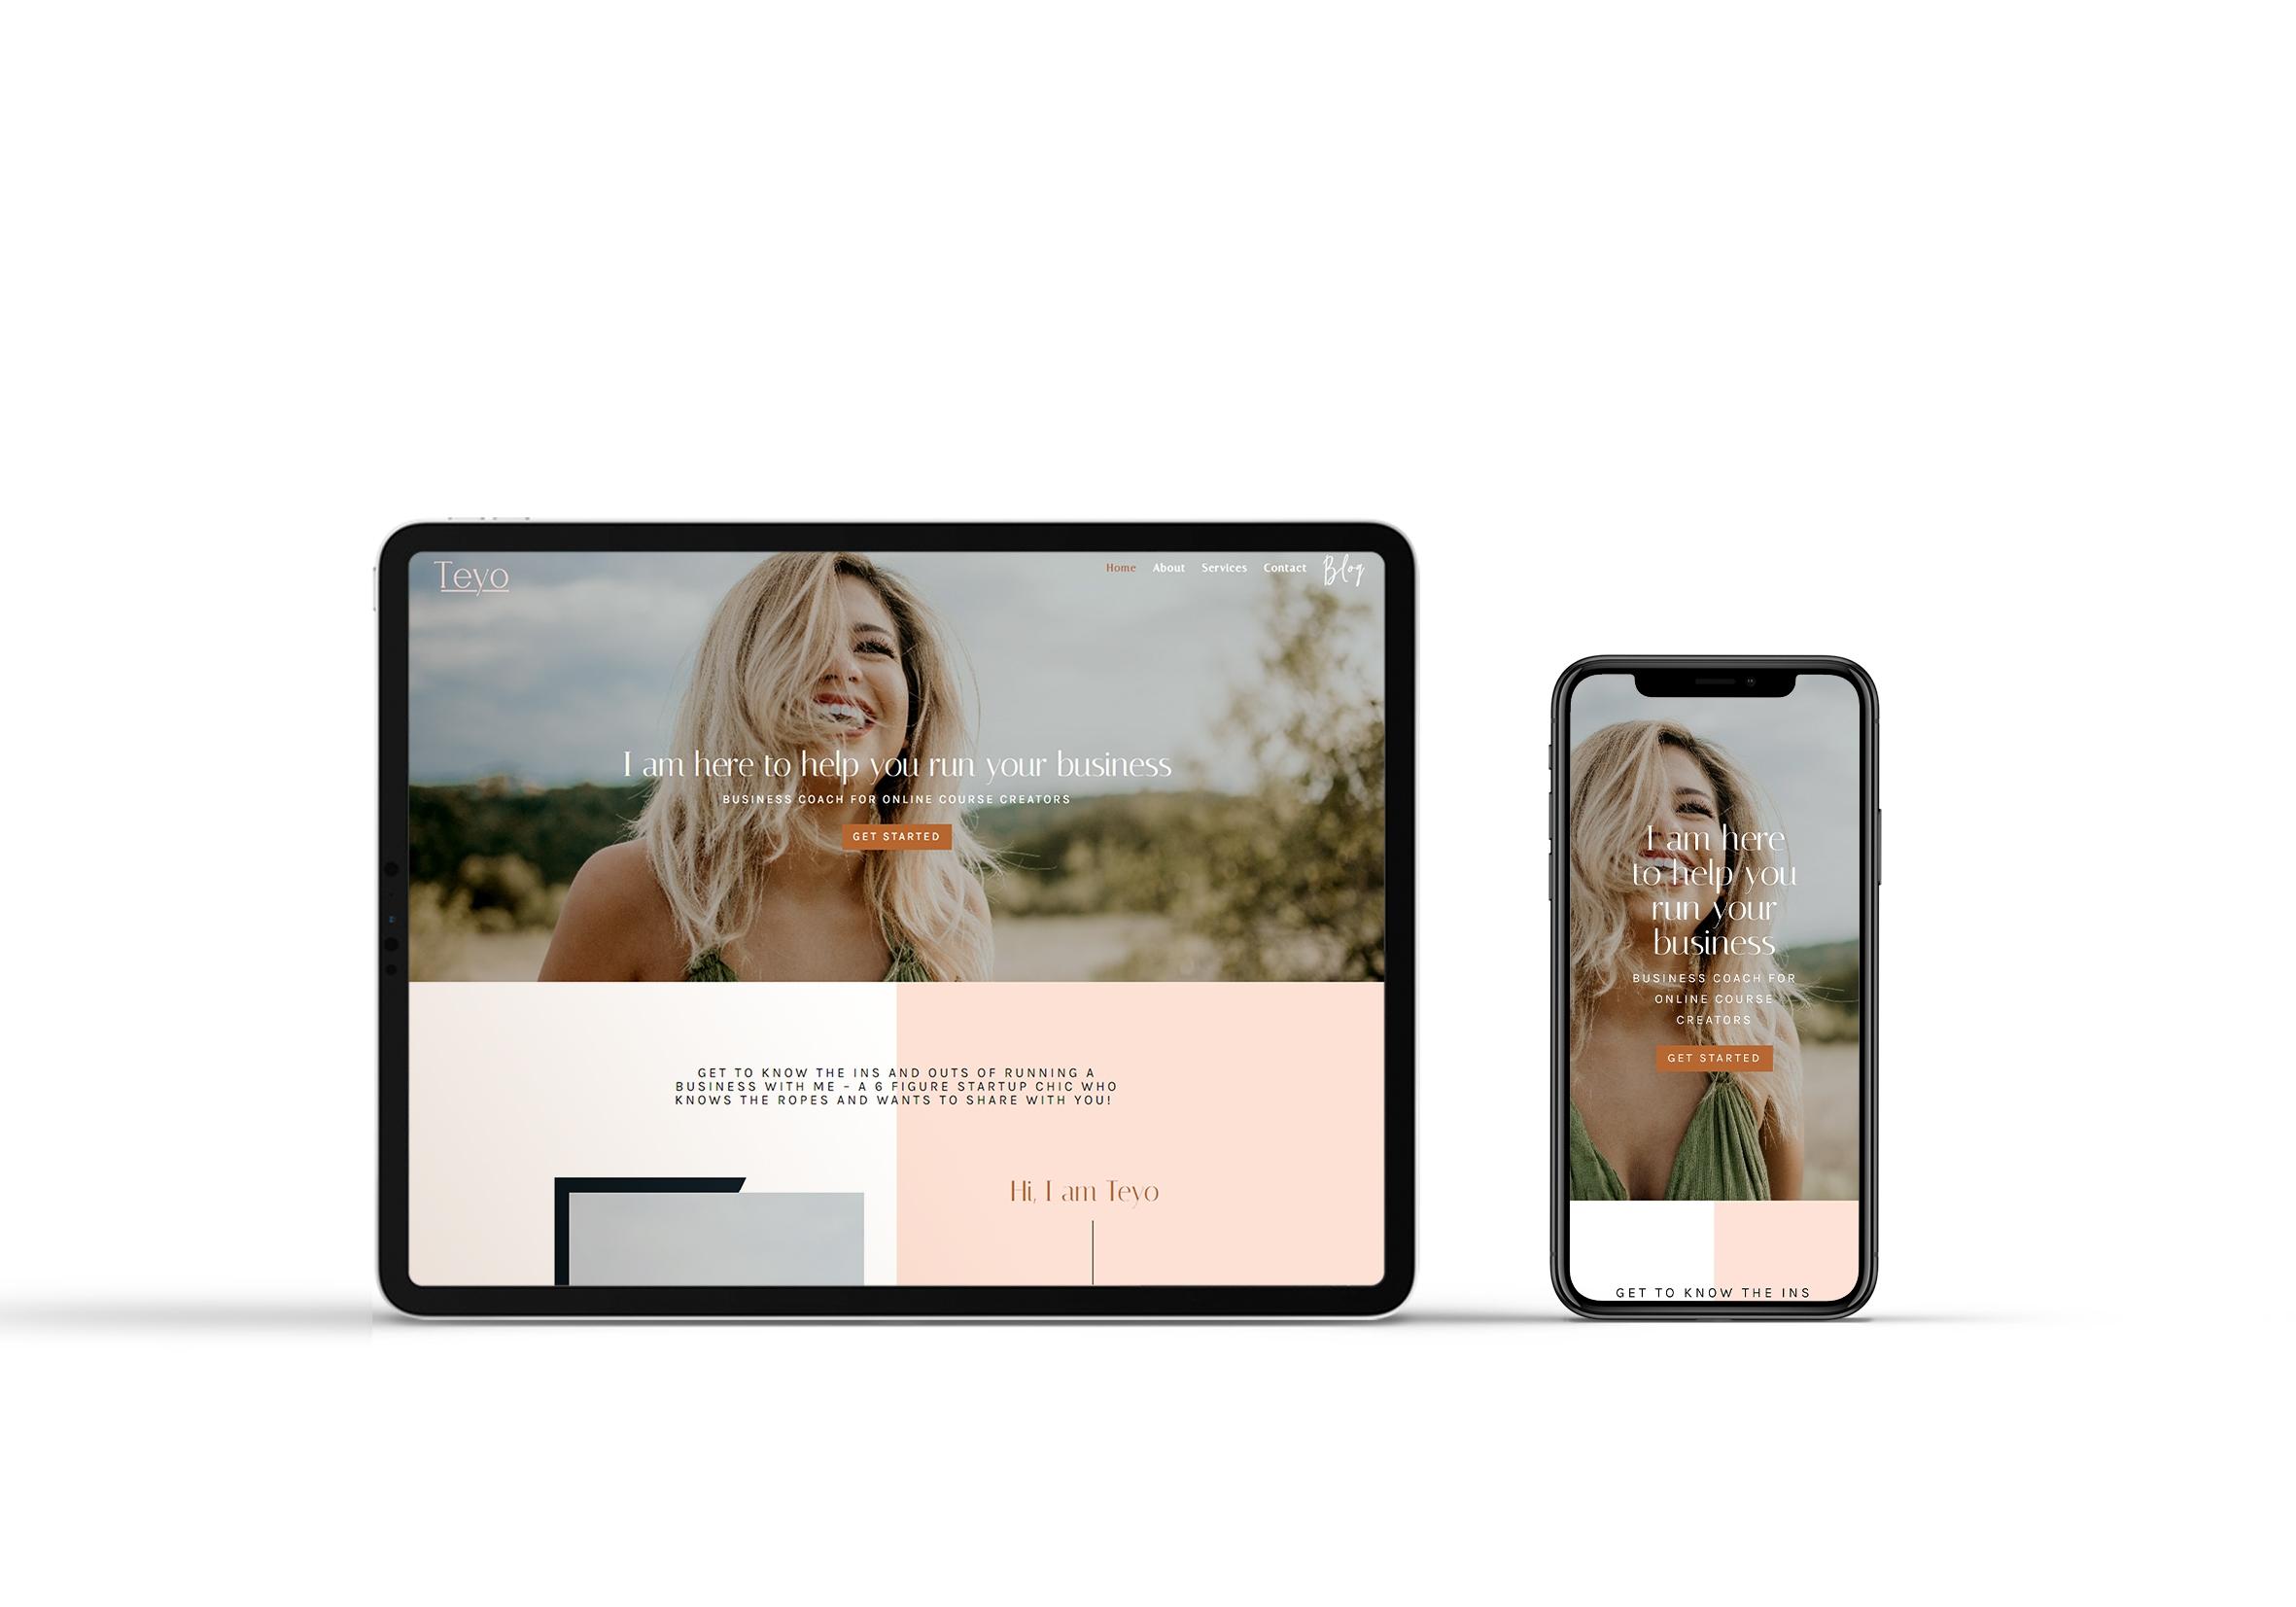 teyo-ipad-and-phone